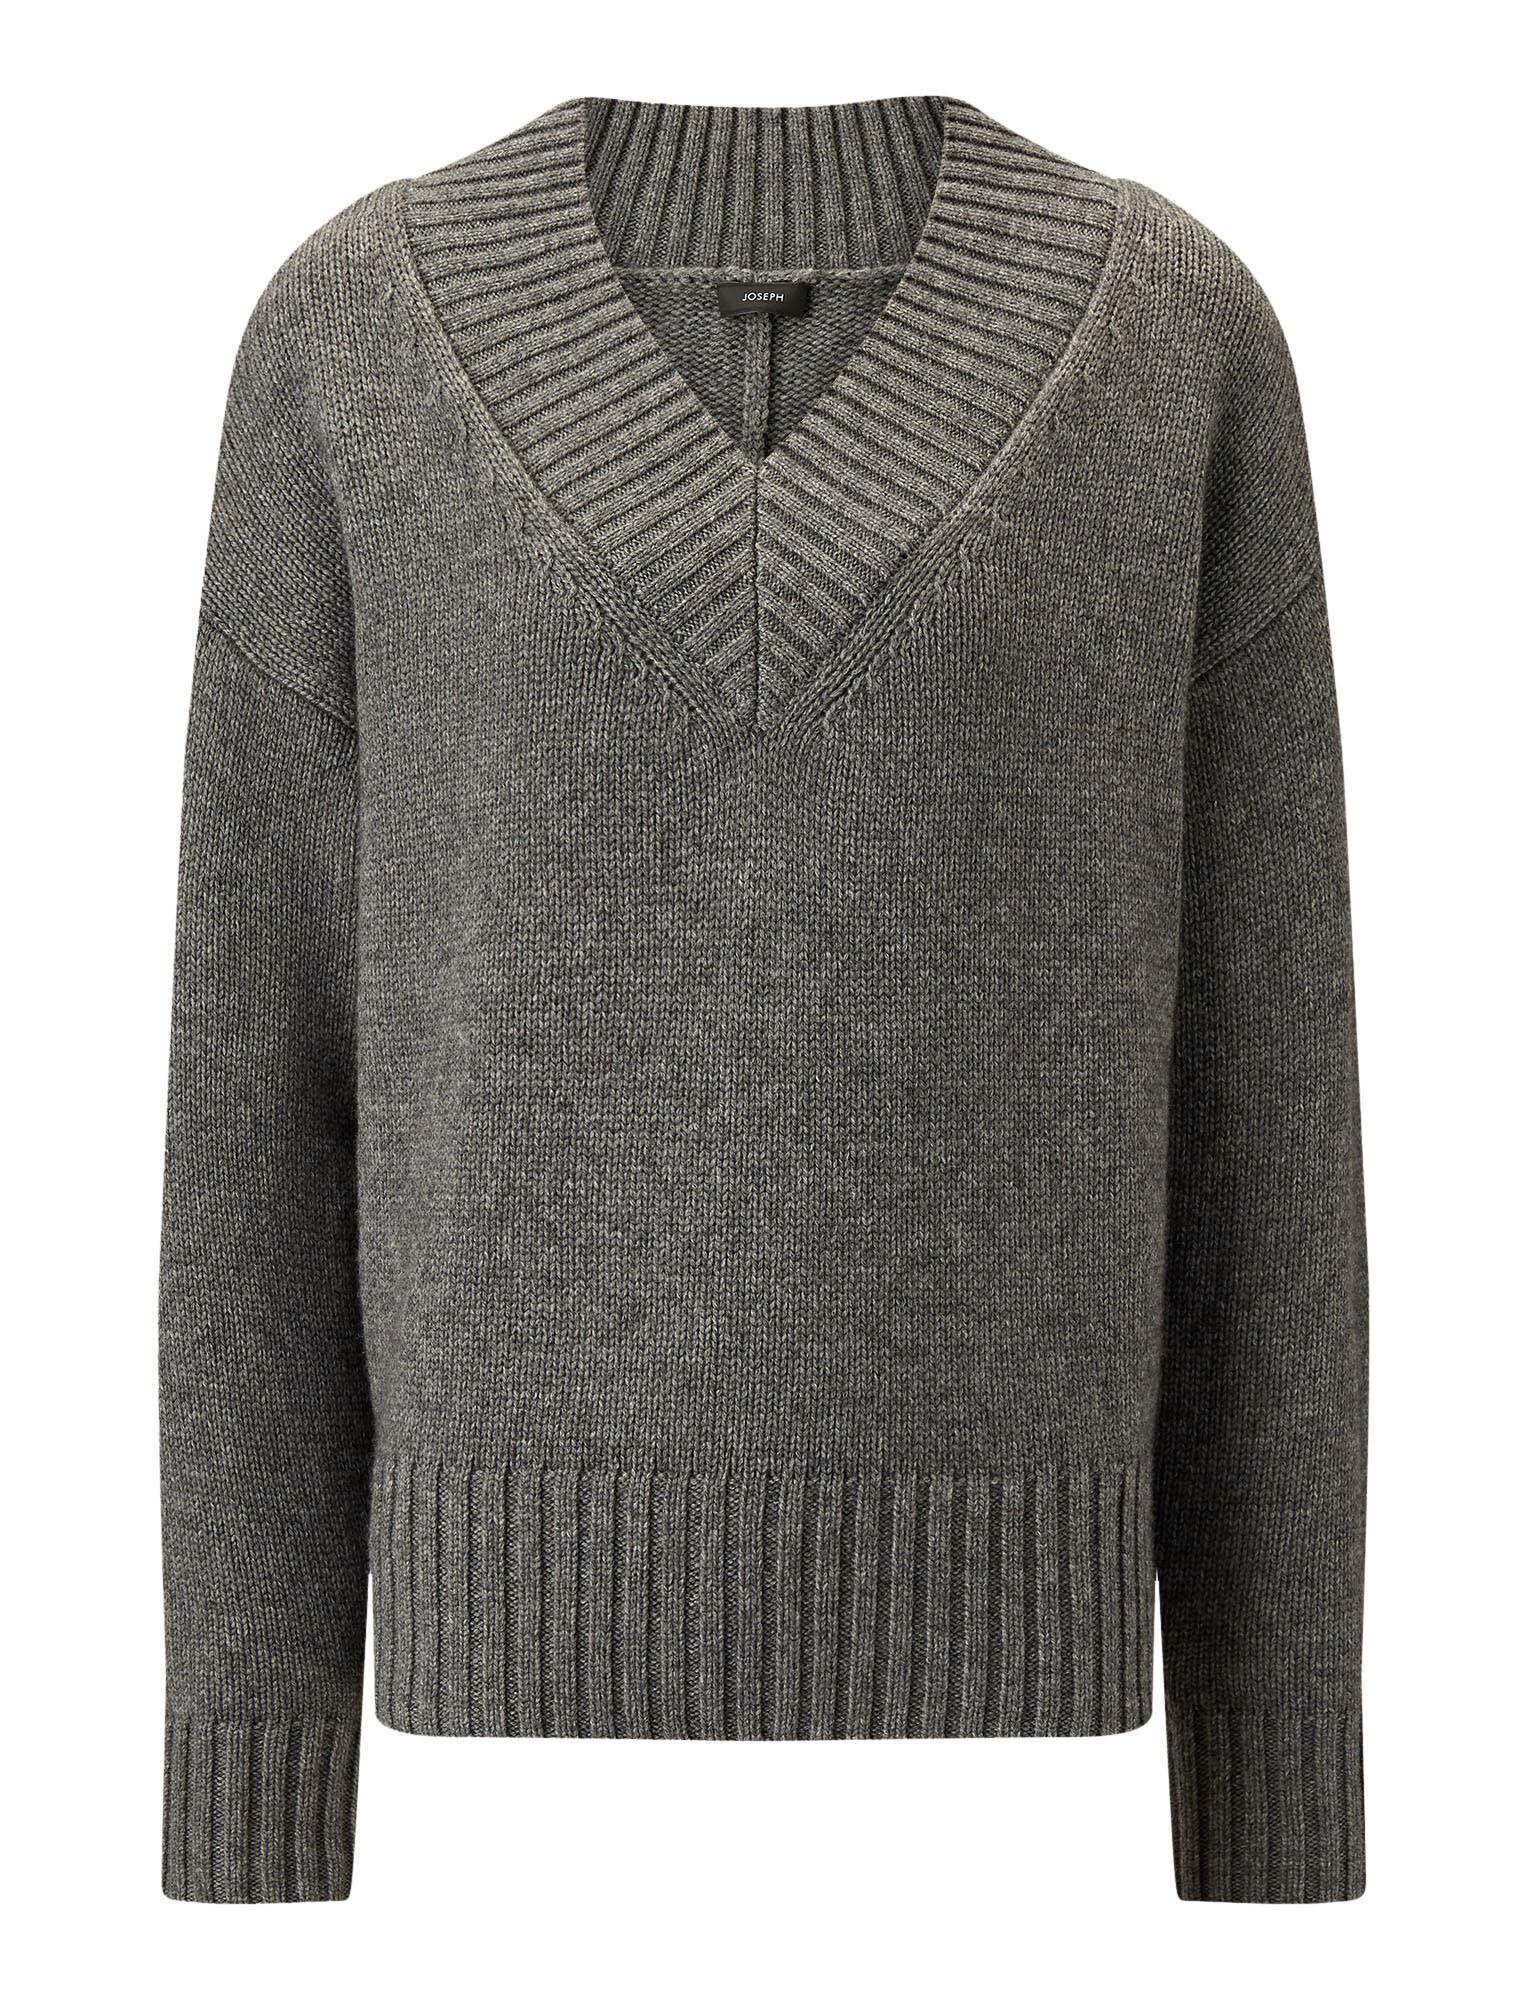 Joseph, V Neck Wool Cashmere Knit, in DARK GREY